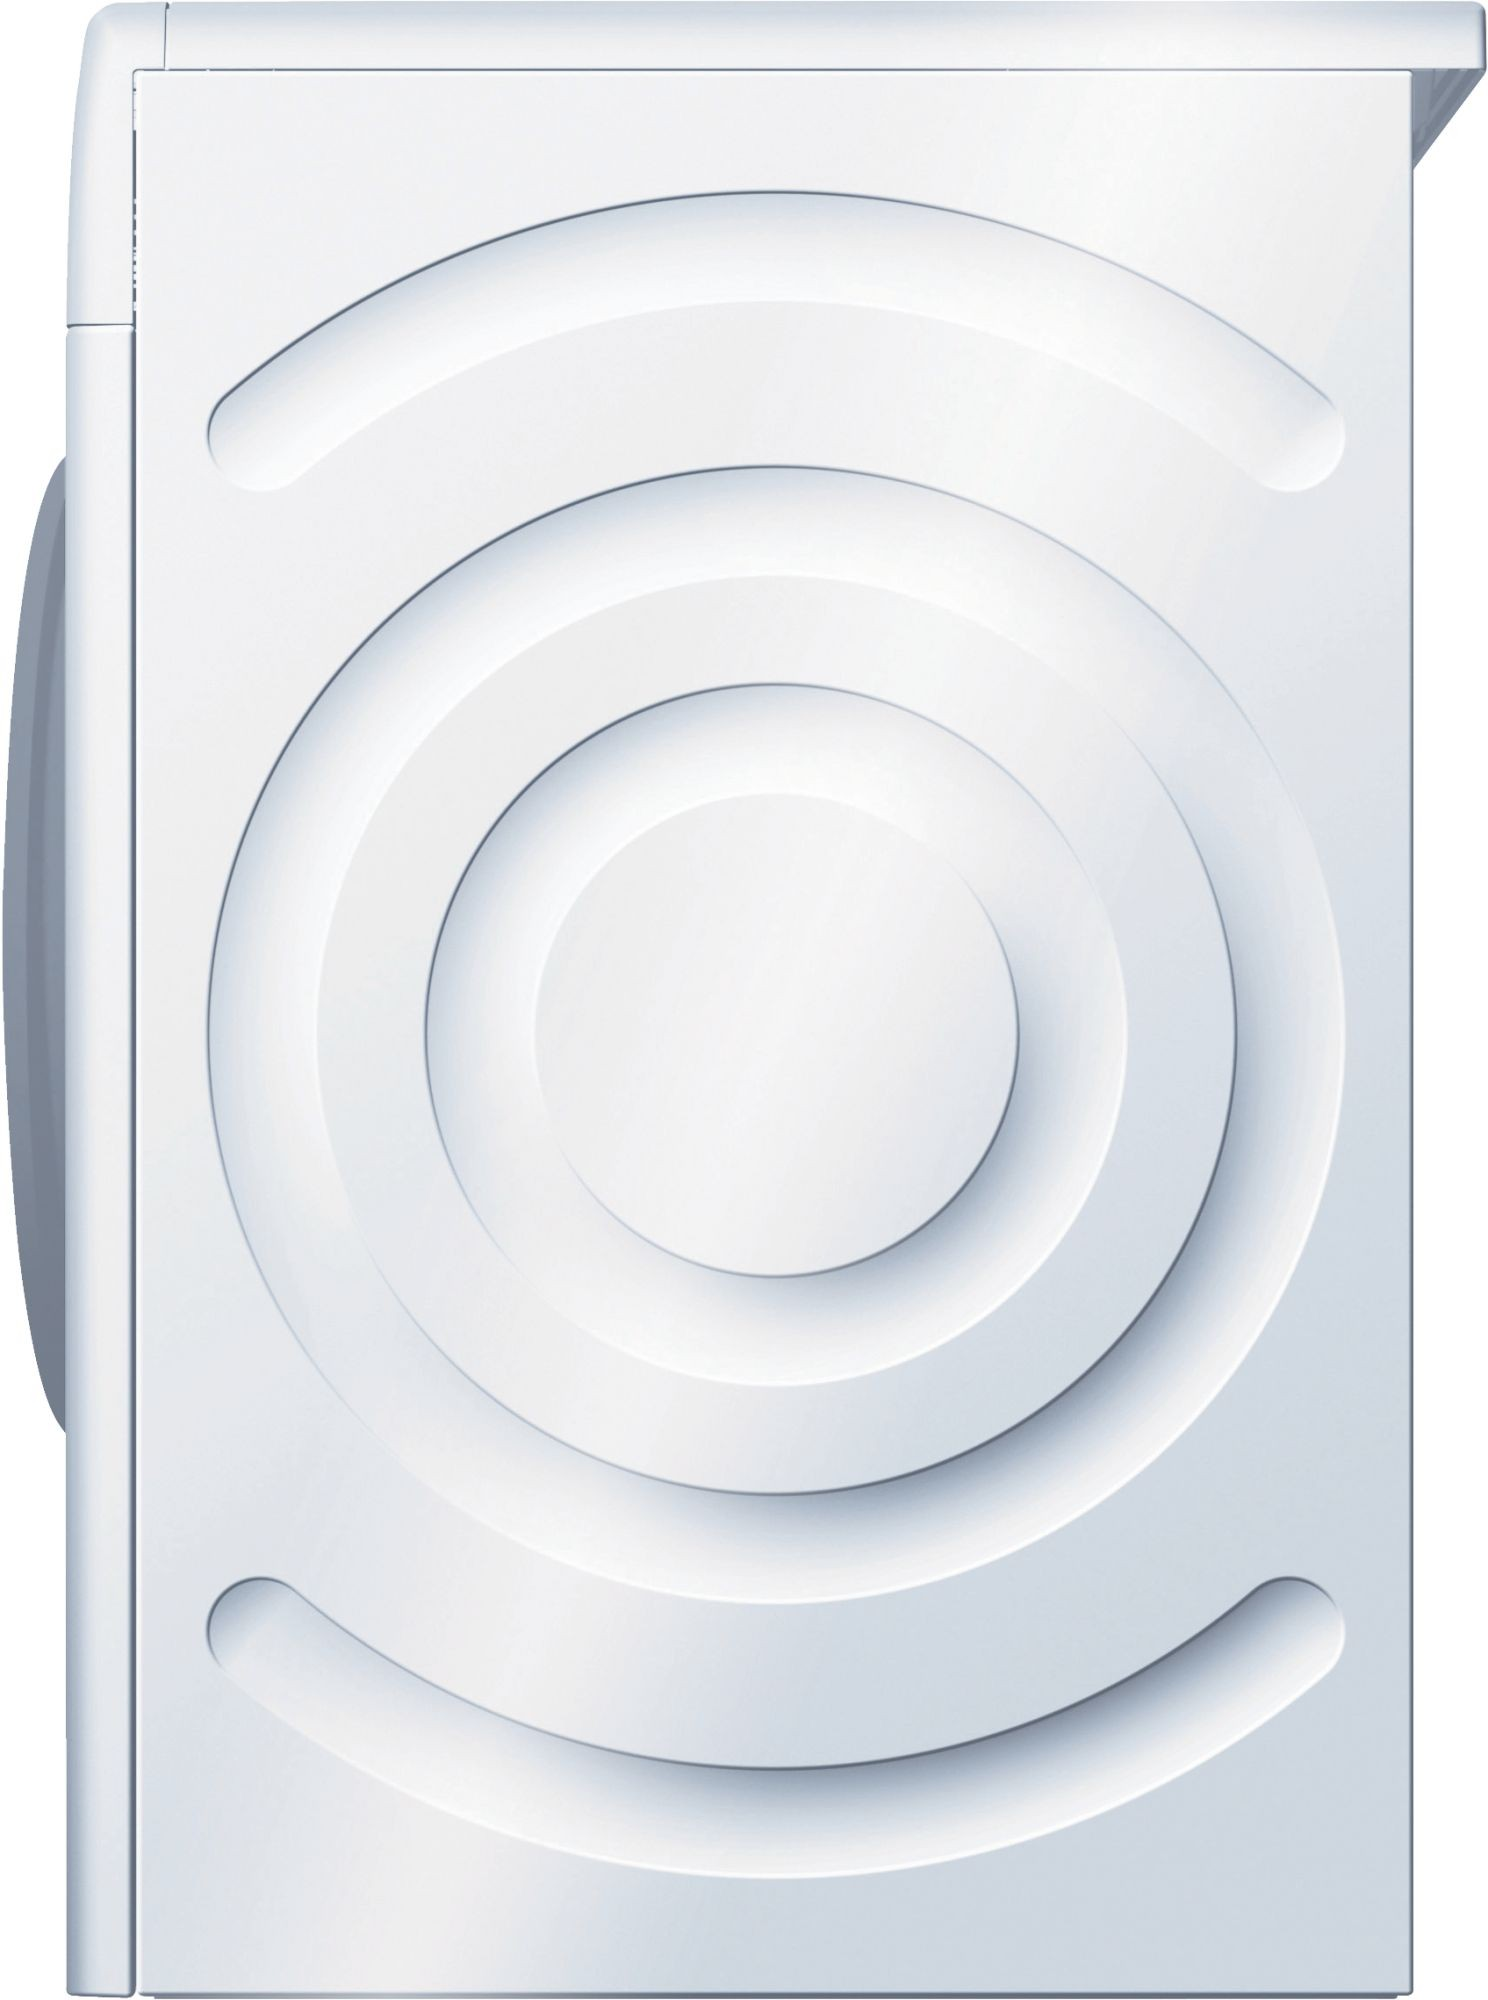 Teamsix wvg30442 weiss bosch elektro gro lavasciuga for Bosch lavasciuga